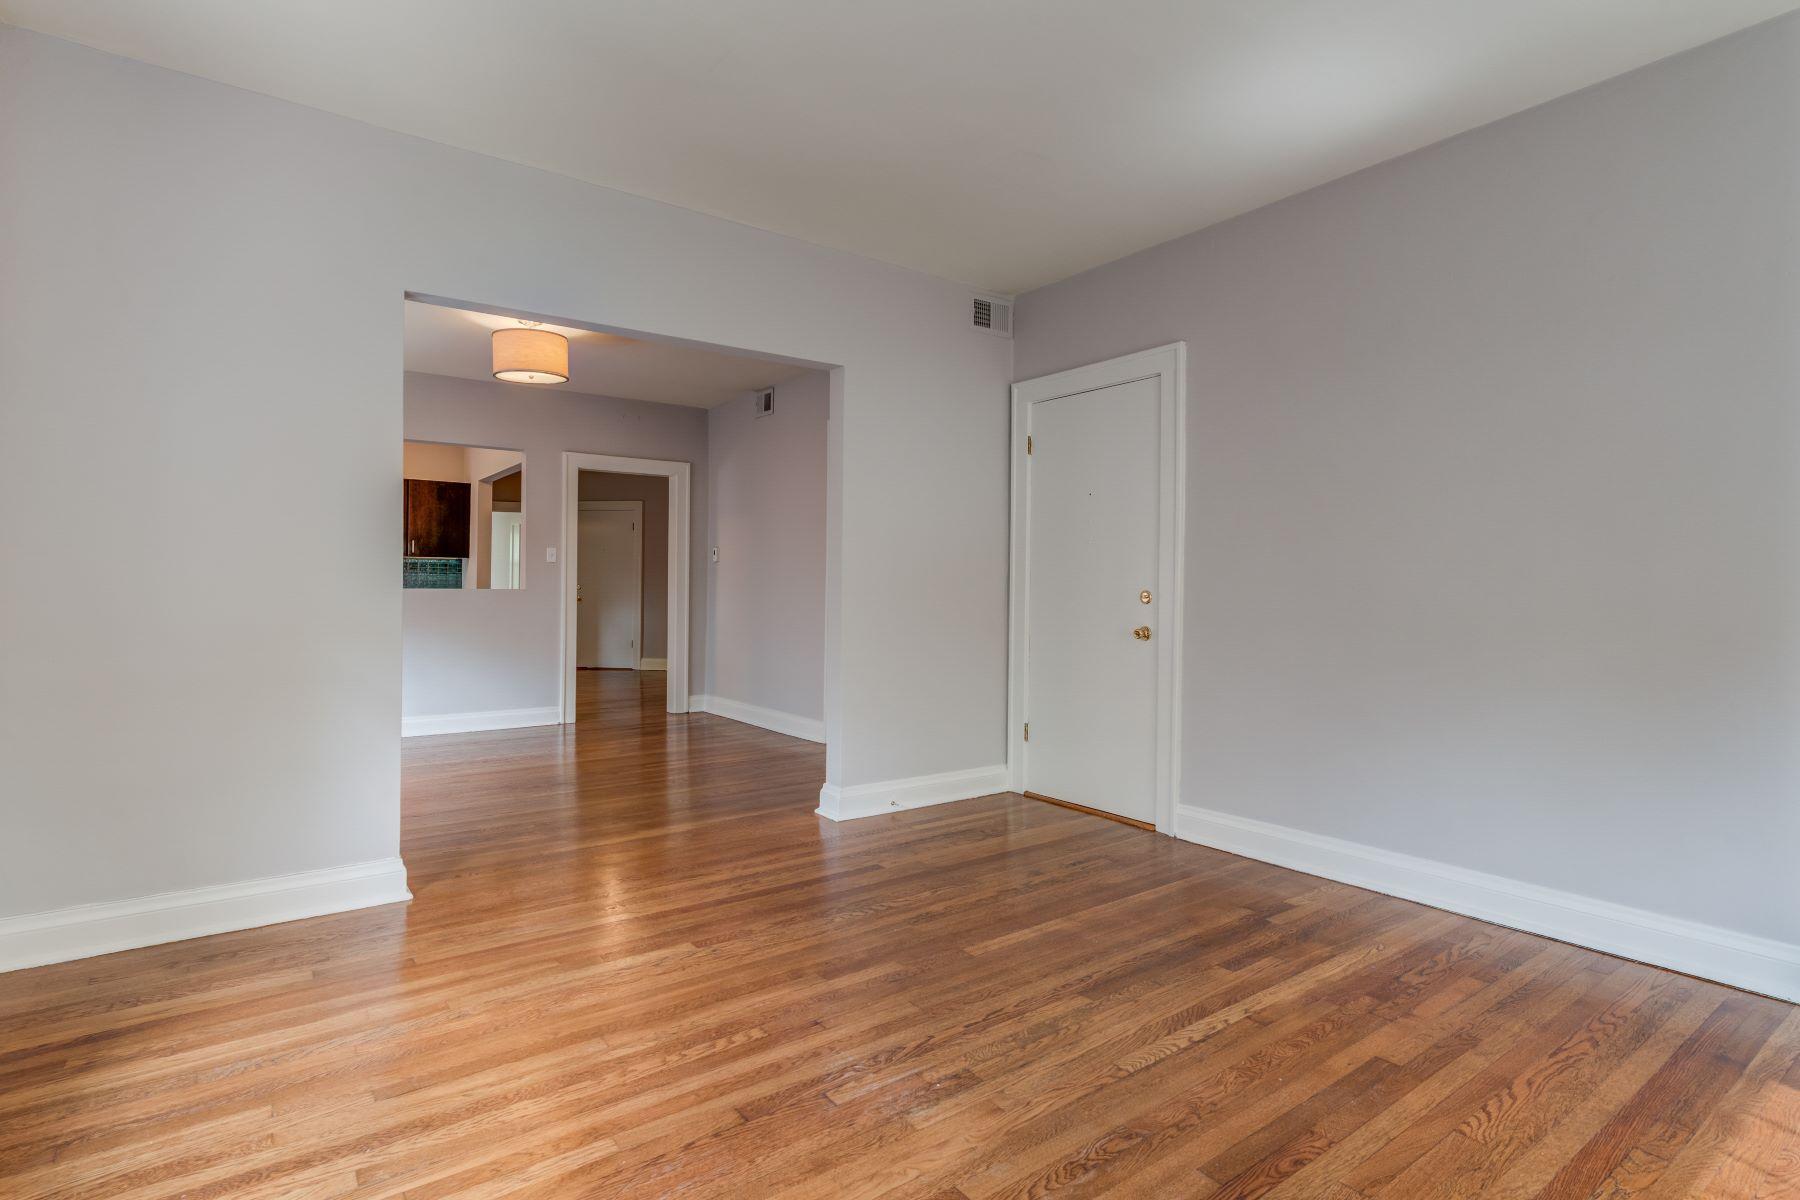 Additional photo for property listing at Clayton Investment Property 905 Concordia Lane Clayton, Missouri 63105 United States